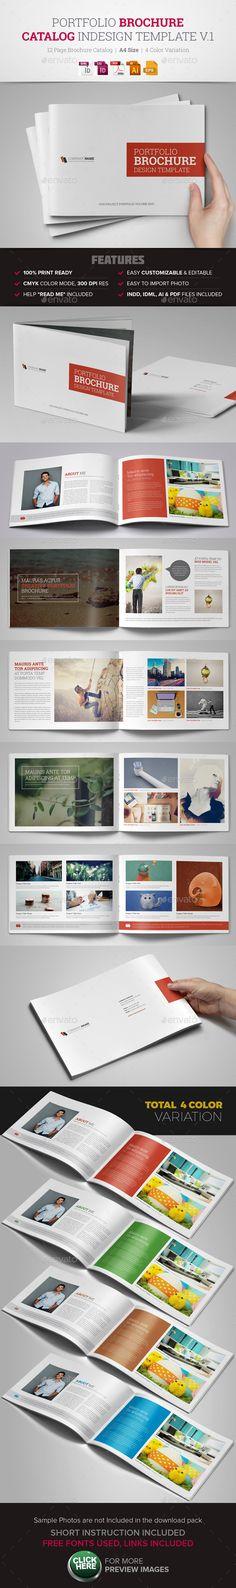 Portfolio Brochure InDesign Template